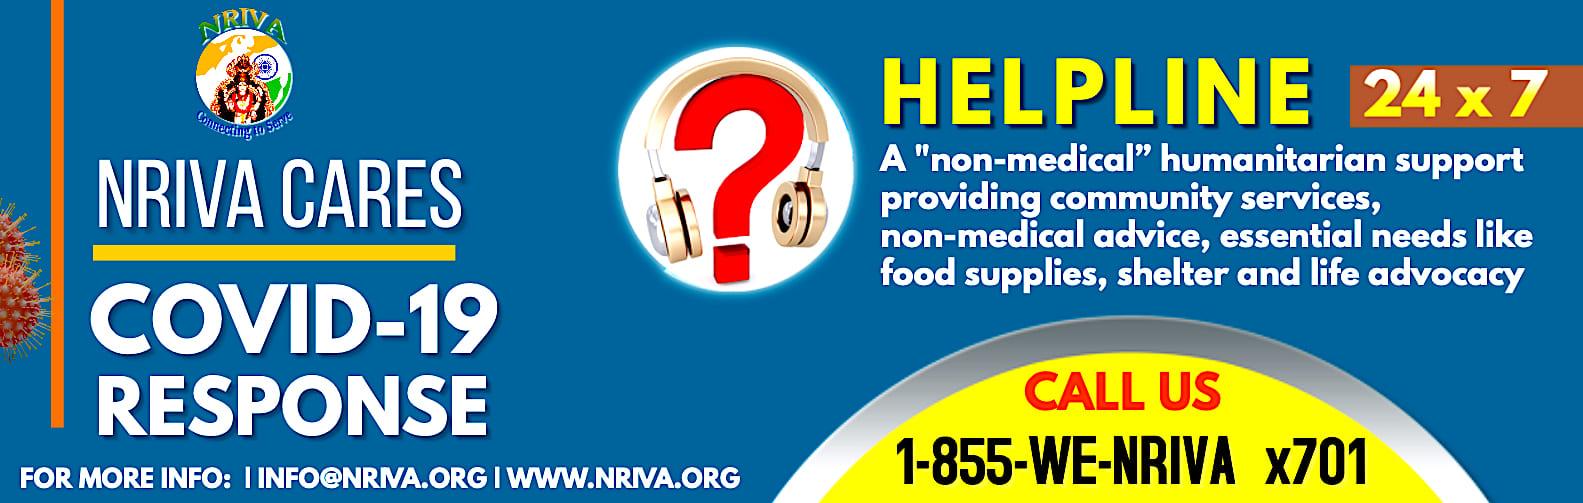 Covid 19 Helpline